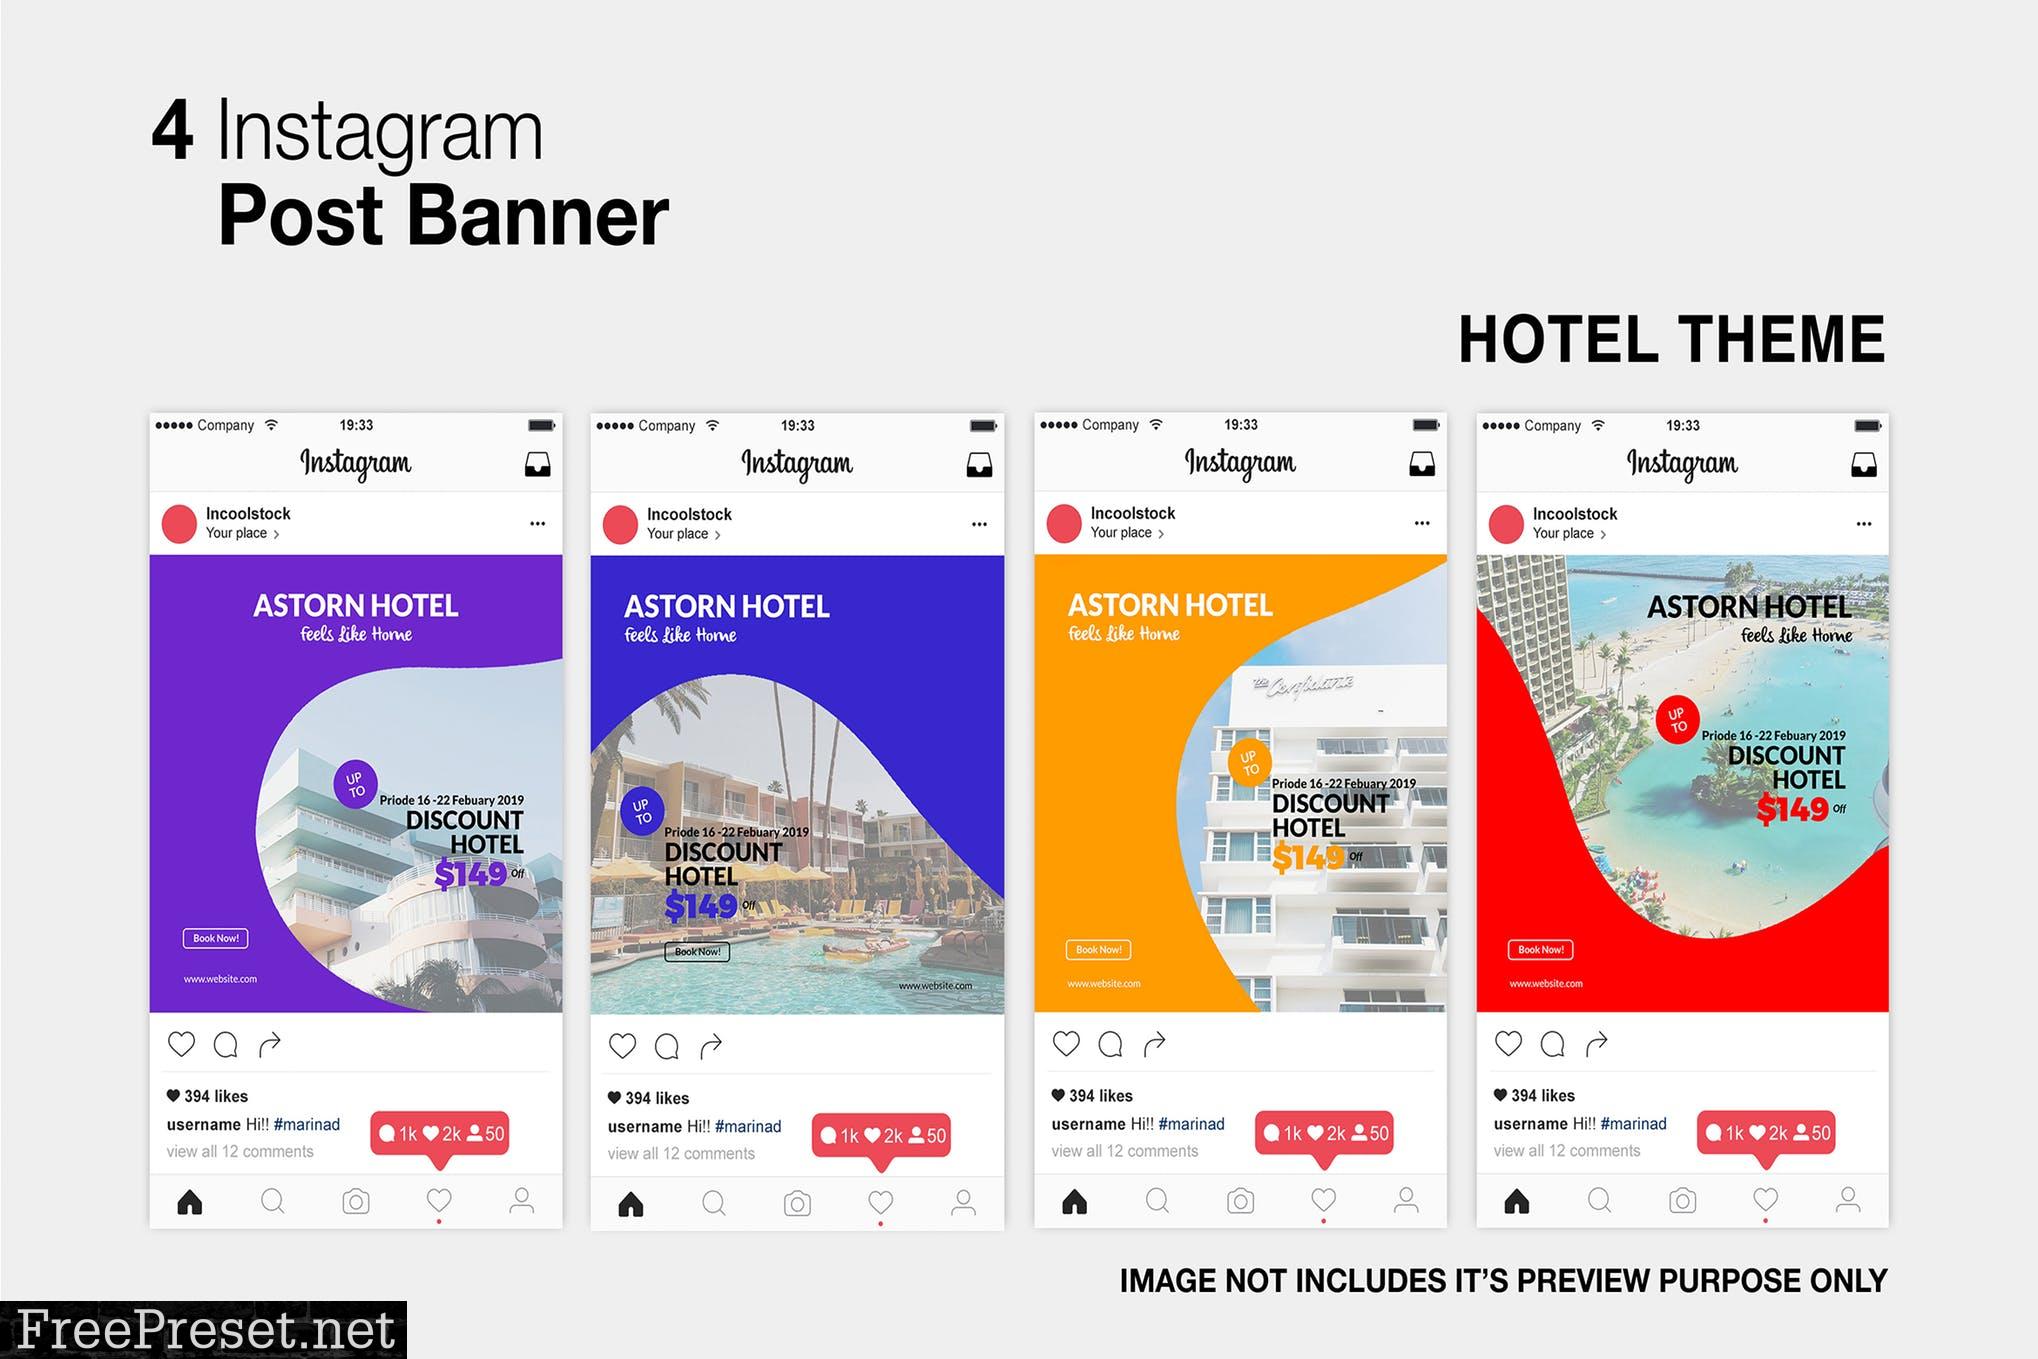 Hotel Instagram Post H2LM7N